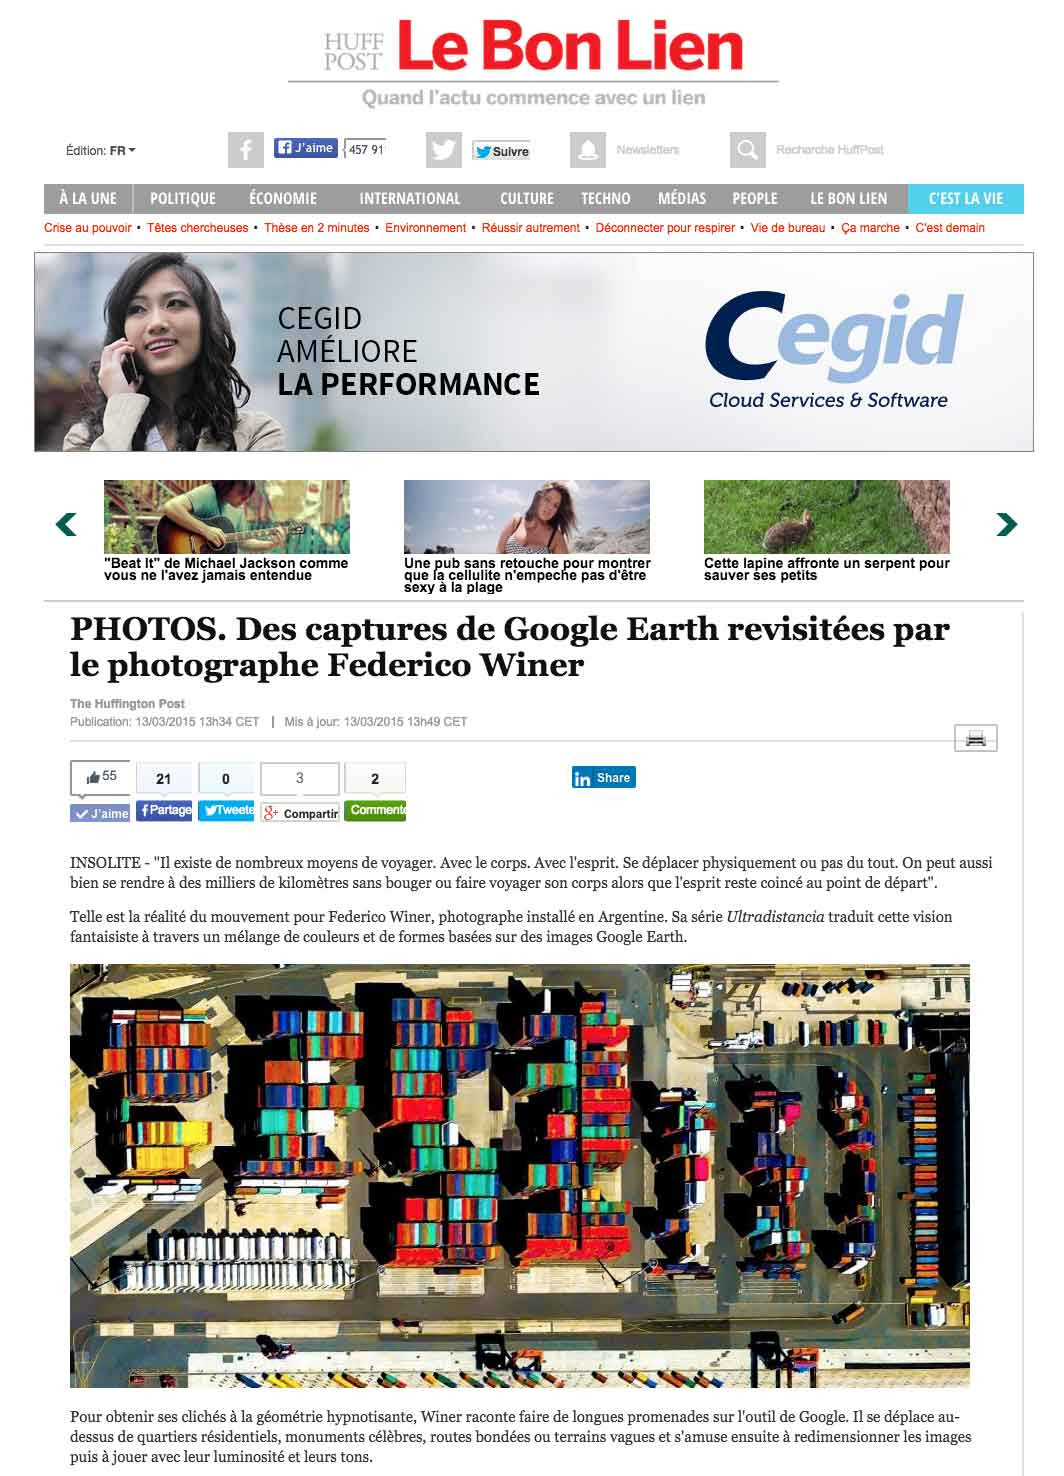 The Huffington Post - FR